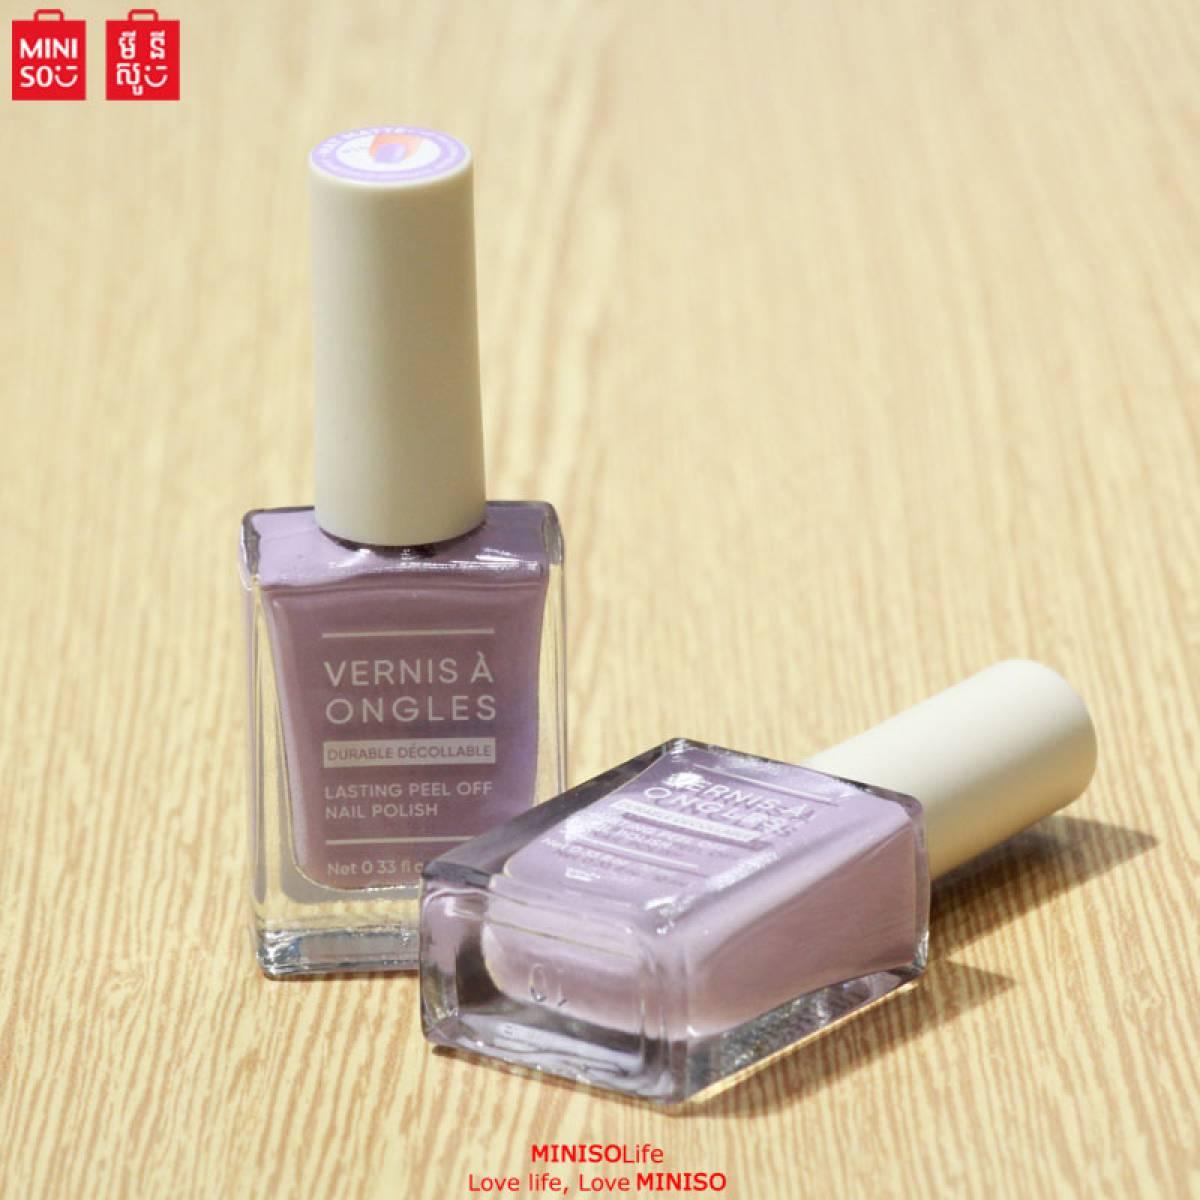 Miniso Lasting Peel Off Nail Polish 14 Buy Online At Best Prices In Pakistan Daraz Pk